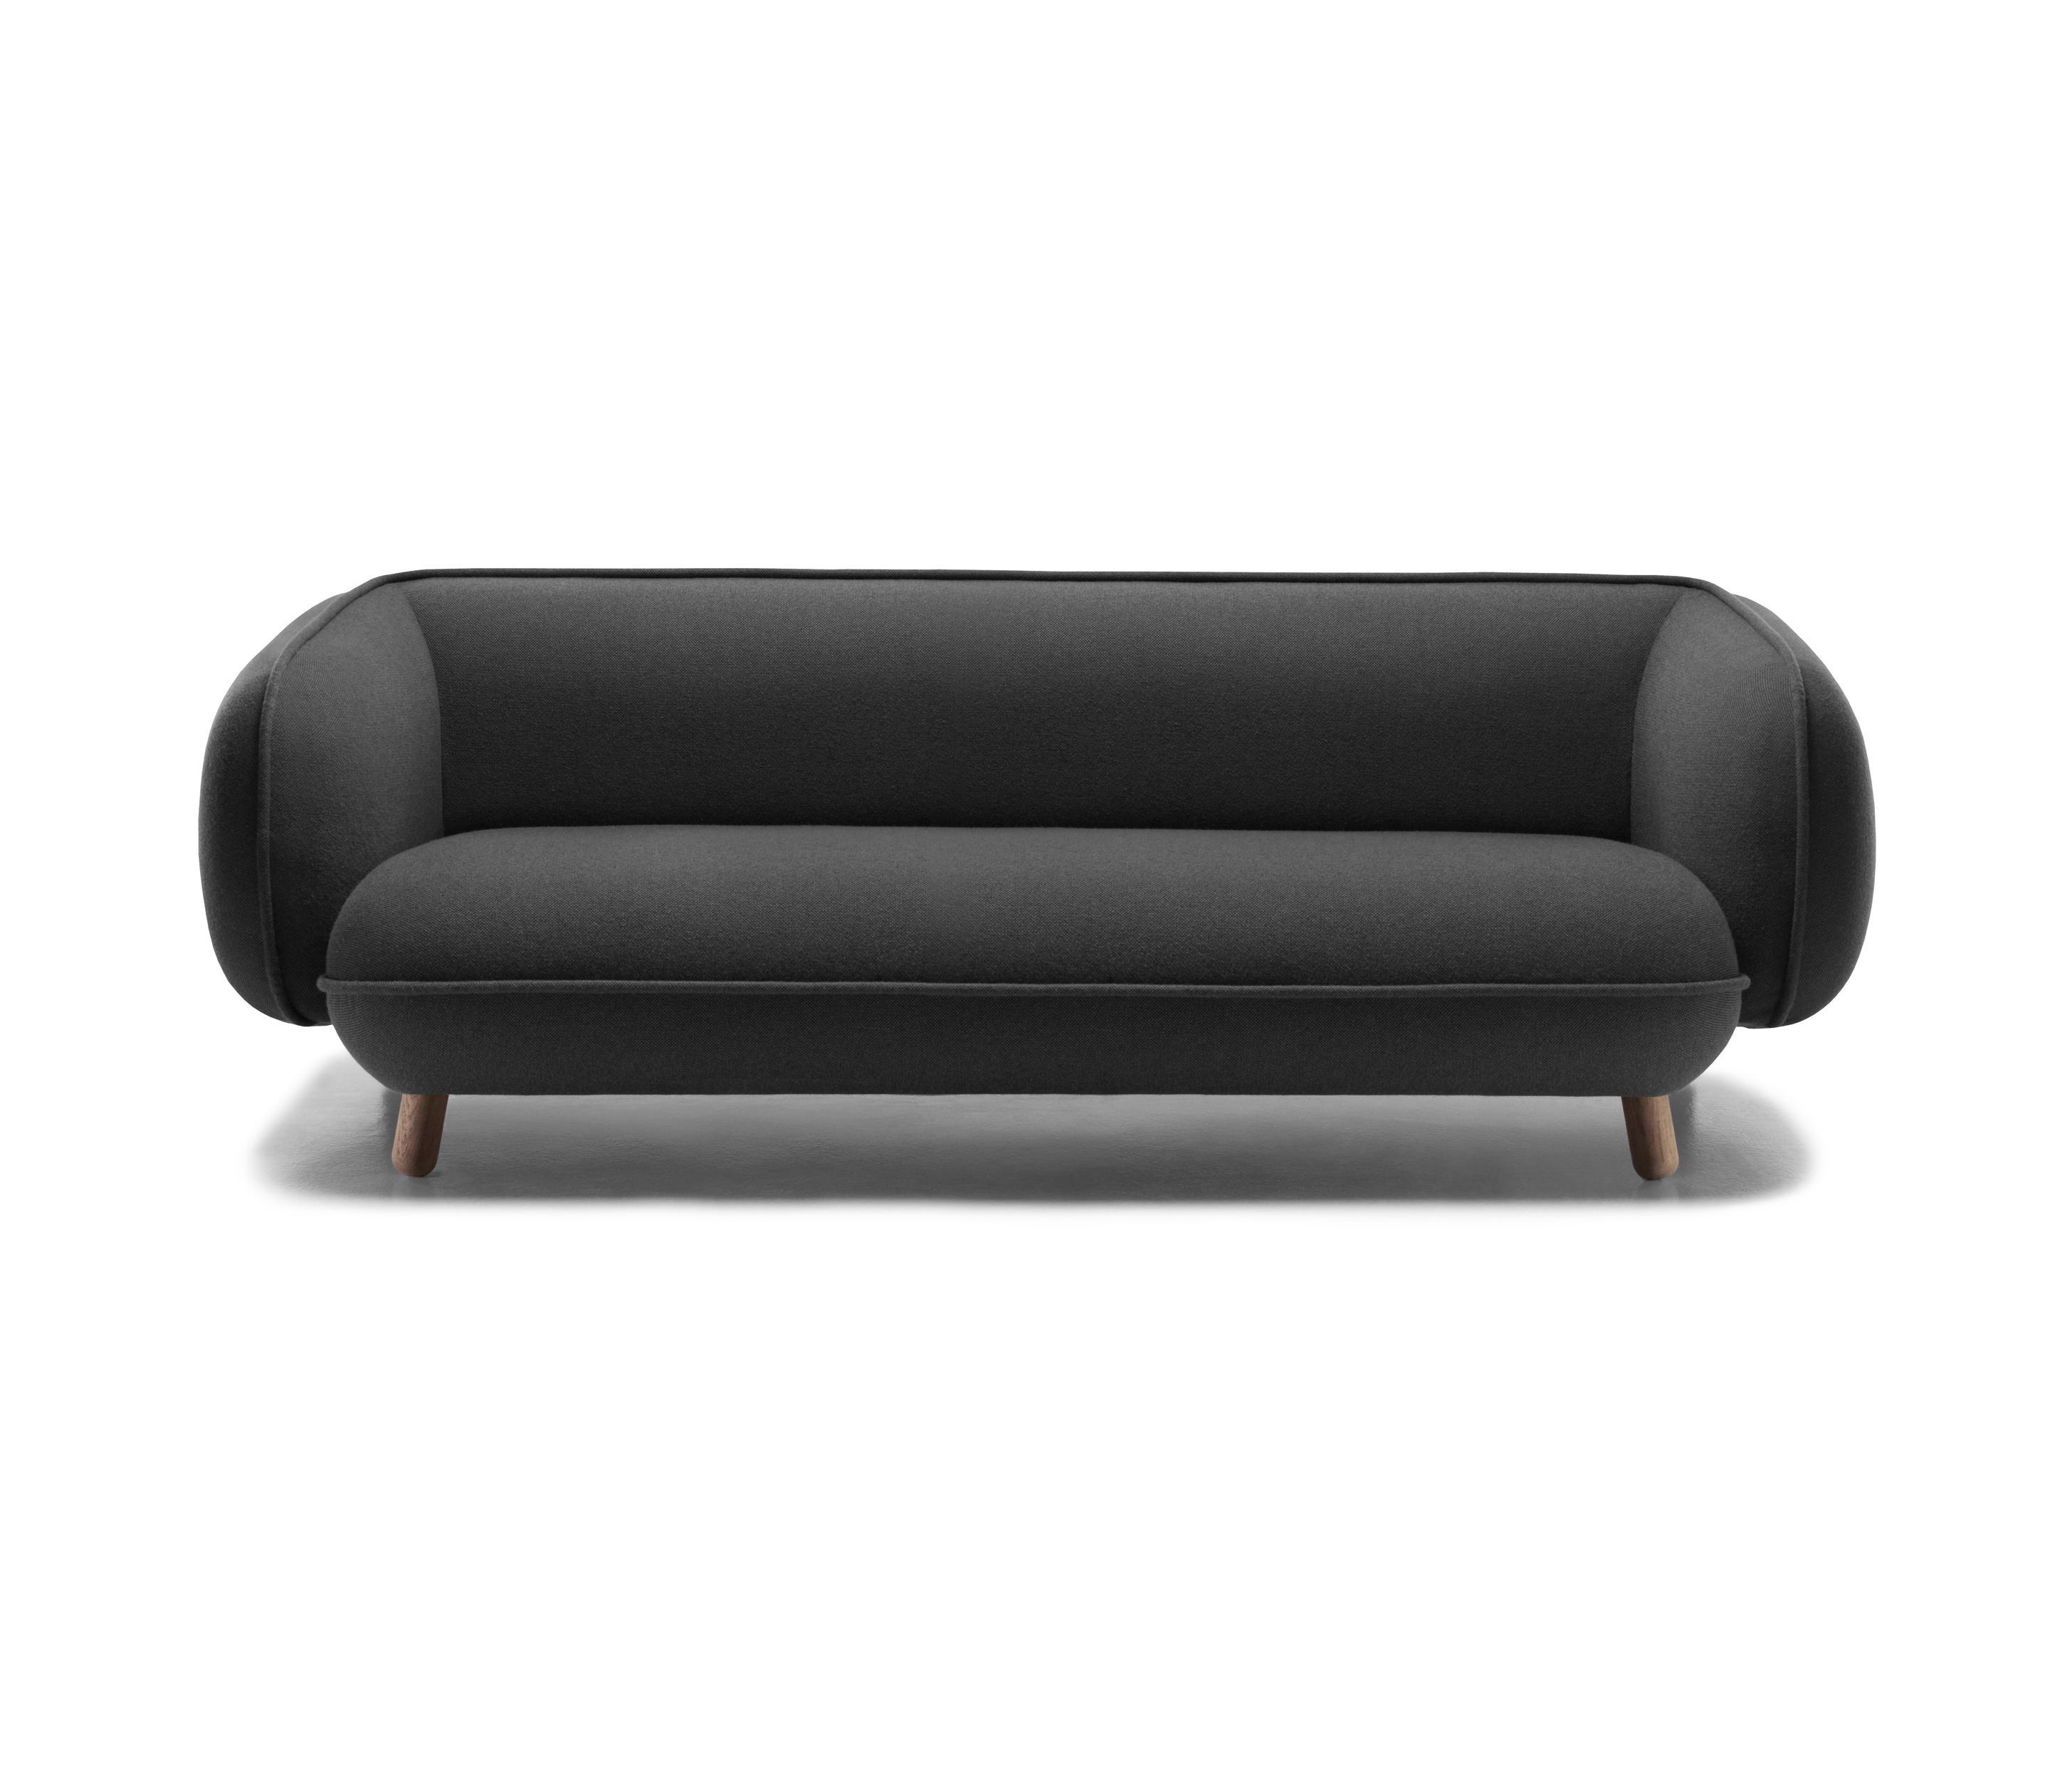 Basset 13 seater sofa & designer furniture  Architonic